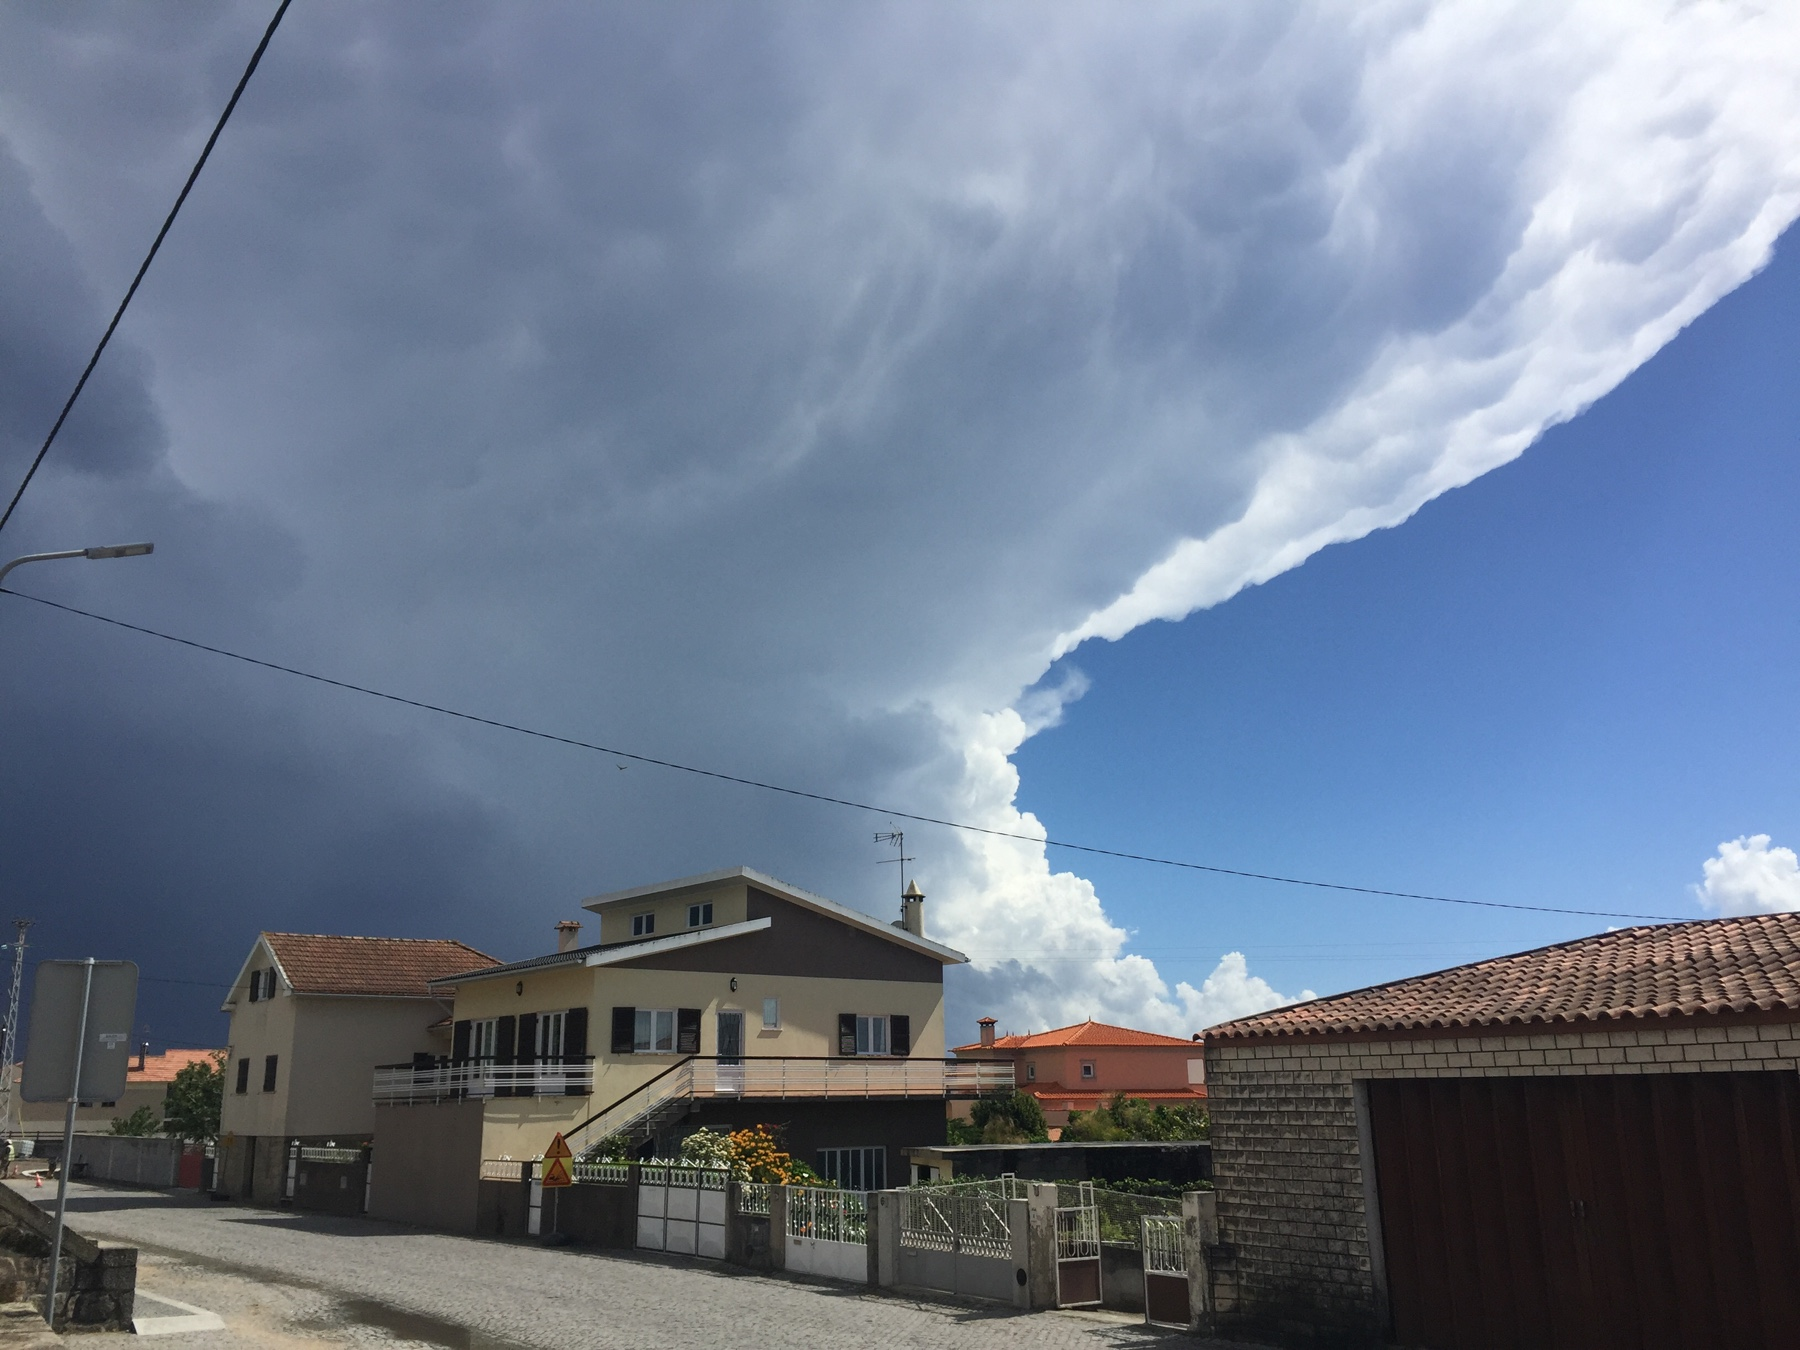 Der Himmel reißt über Marinhas auf. Caminho Portugues